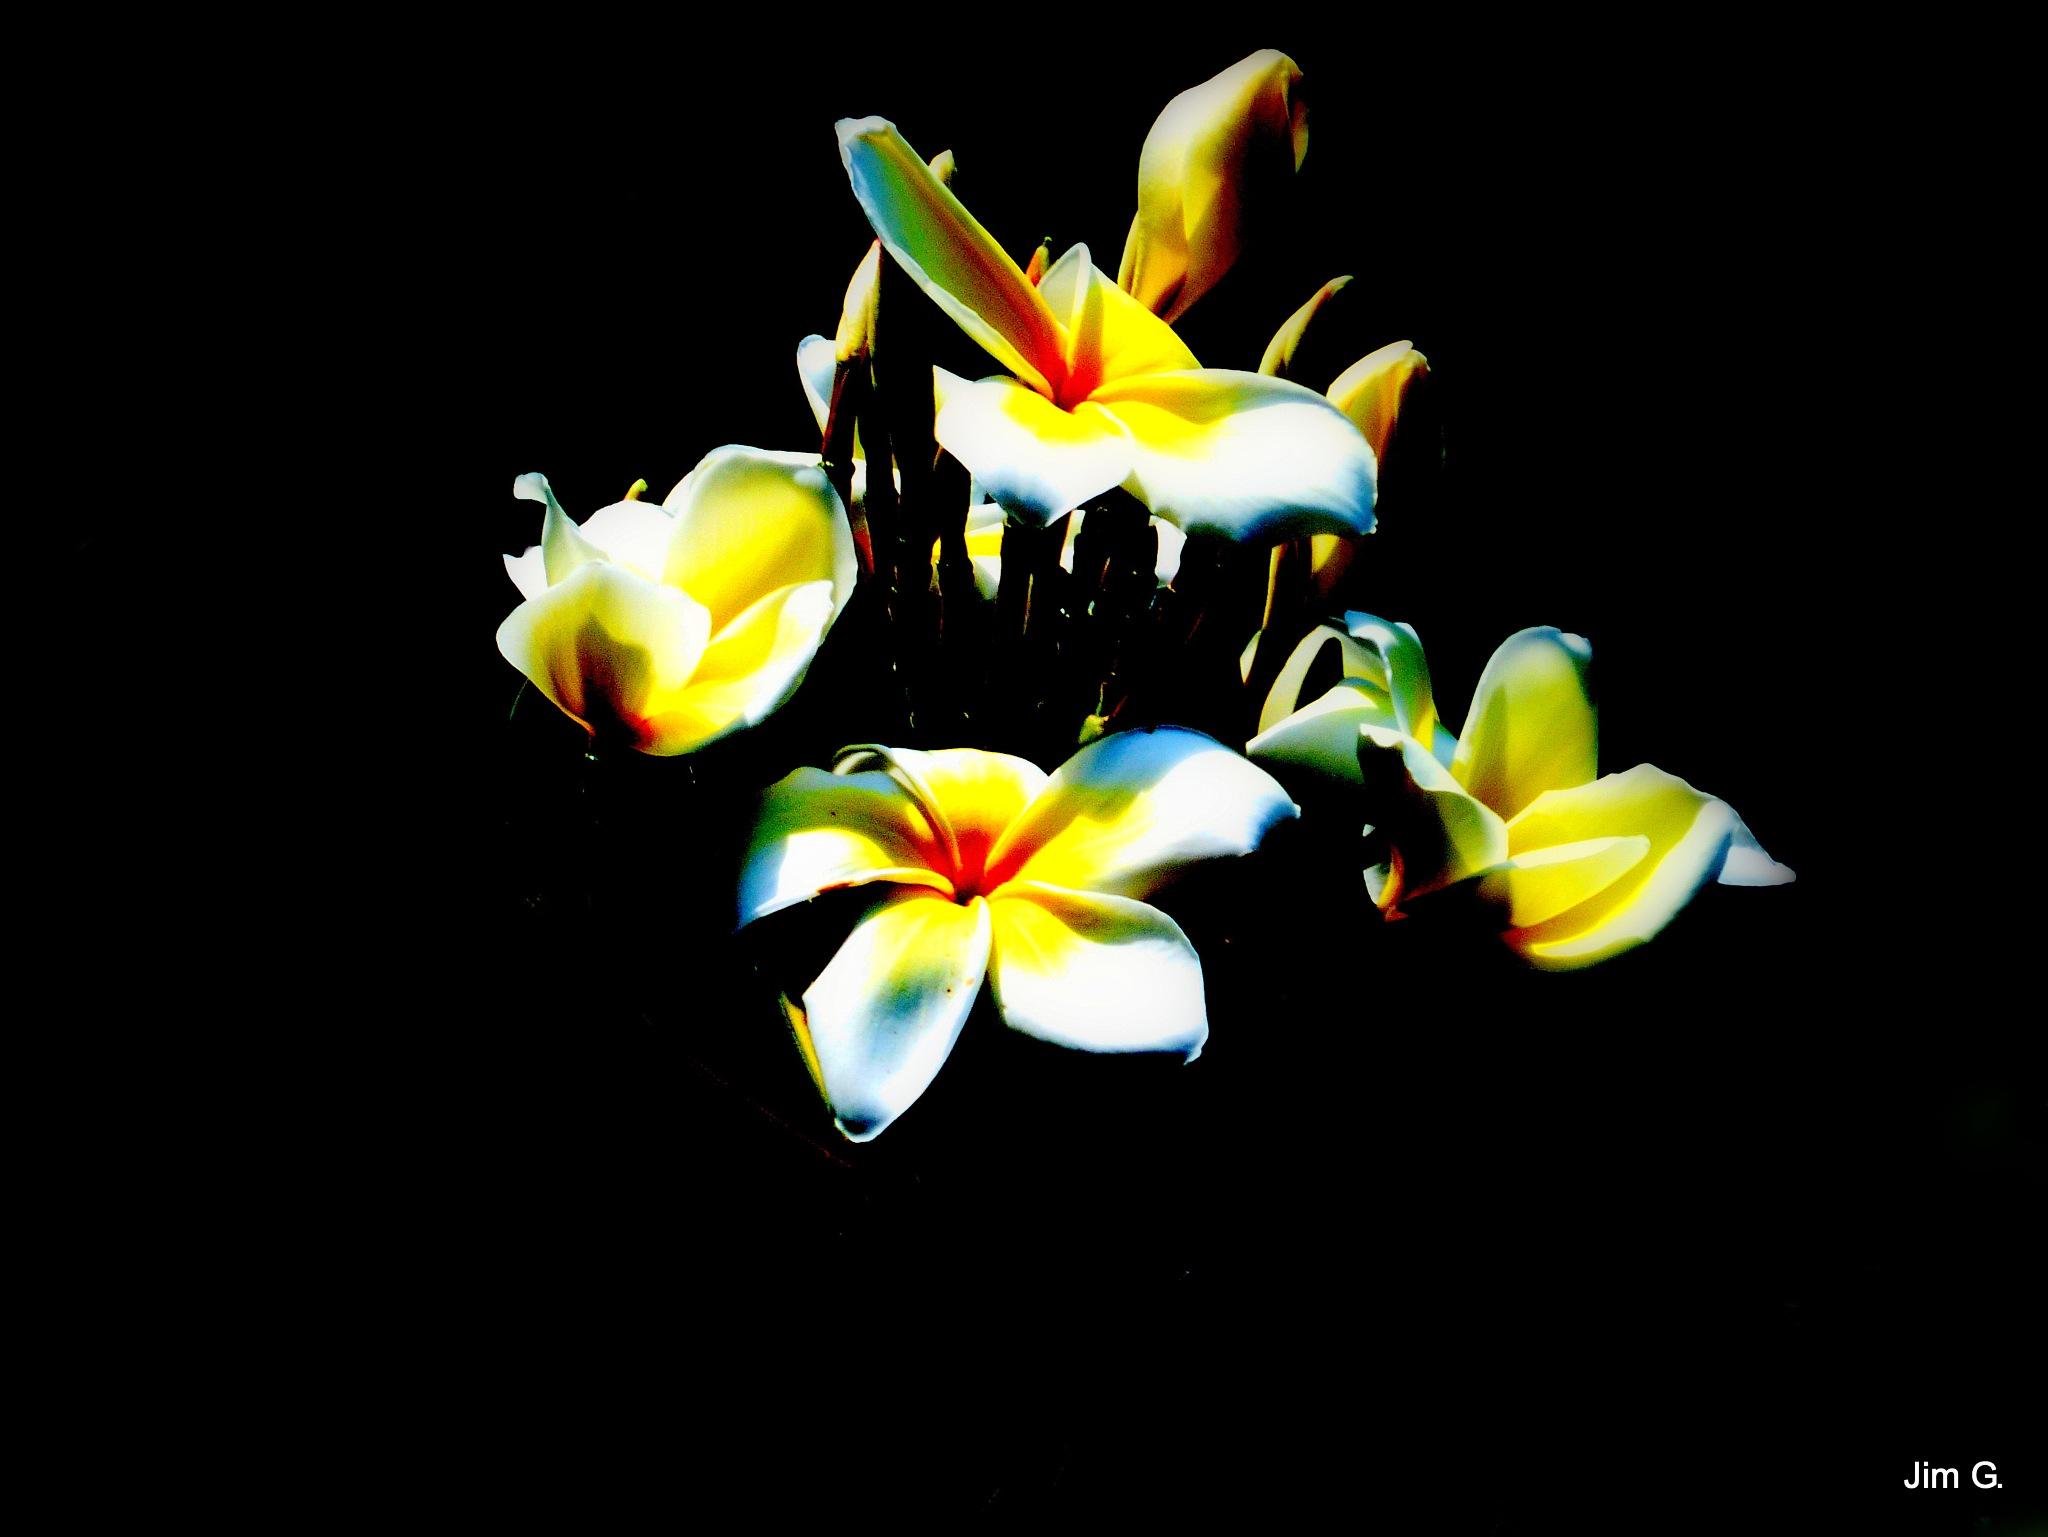 Plumeria at night by Jim Graham